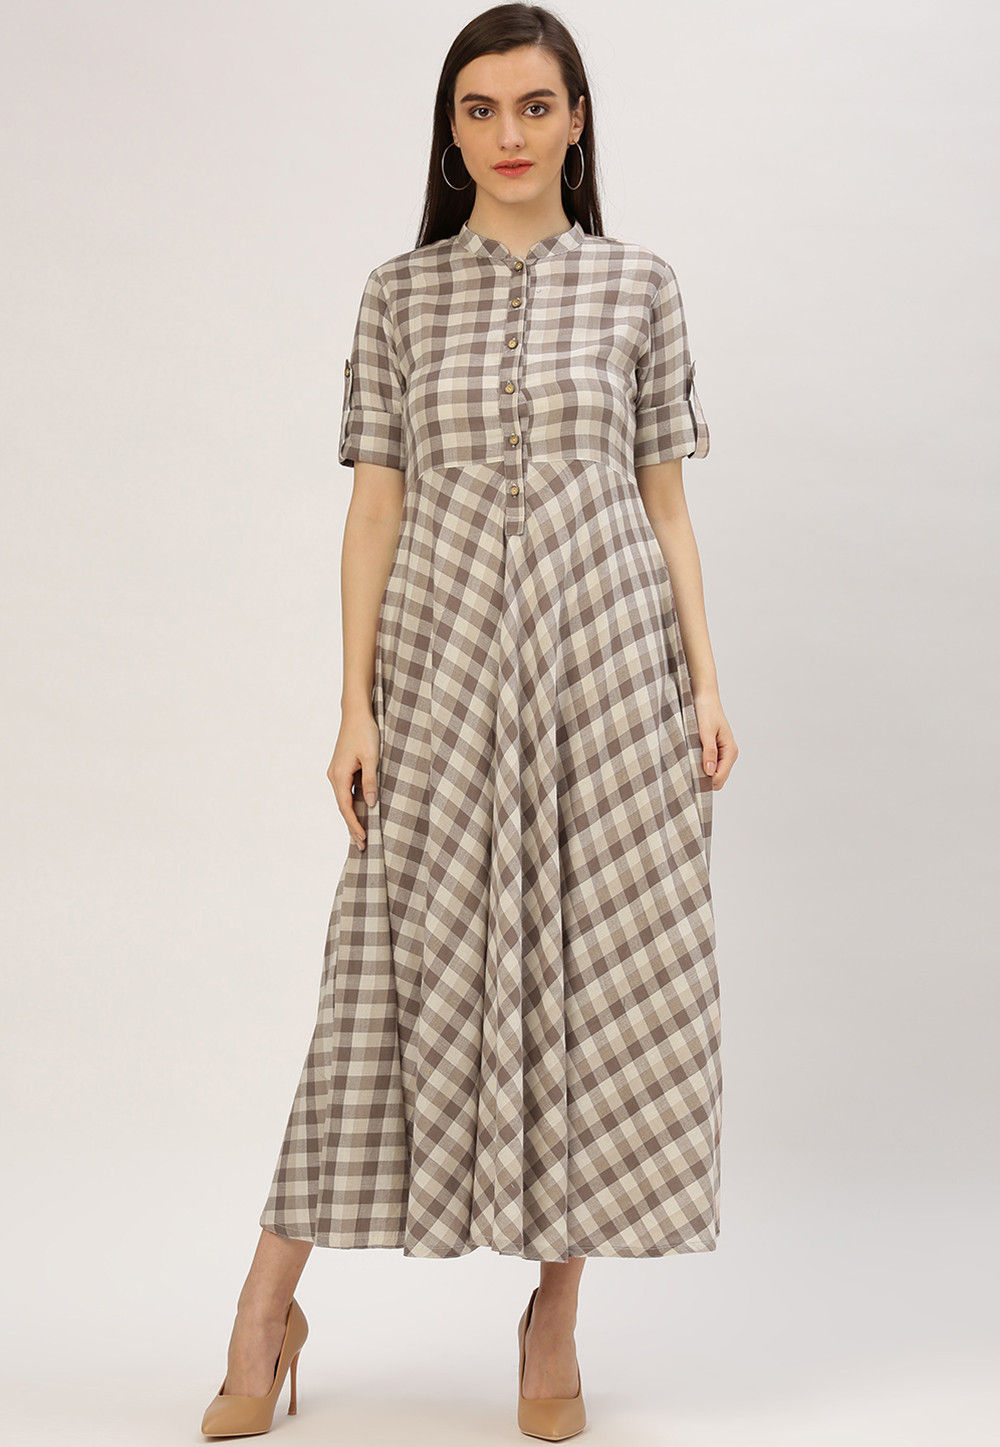 Handloom Cotton Flared Shirt Style Kurta in Brown